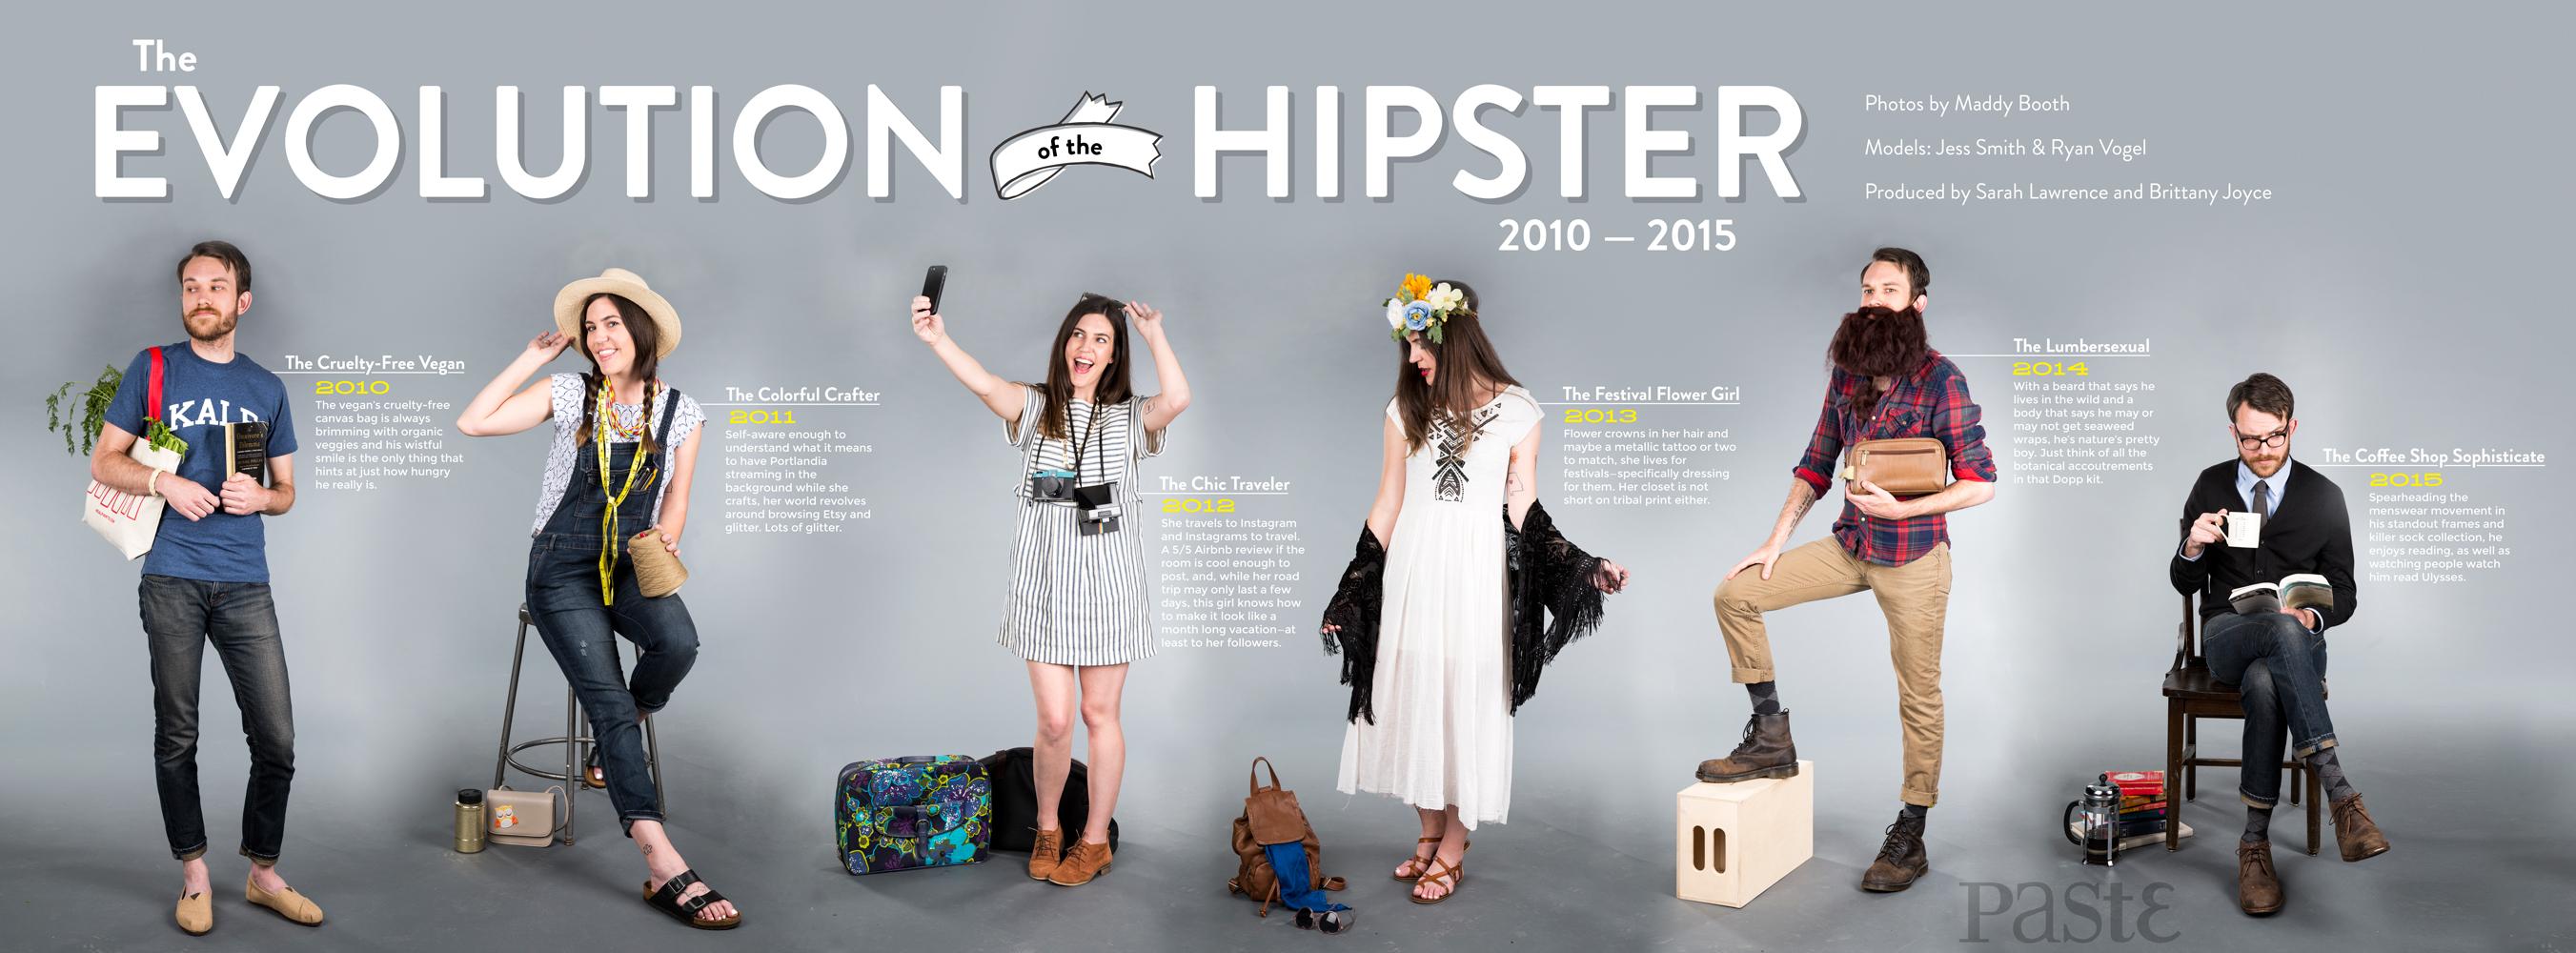 Evolution of a Hipster 2010-2015